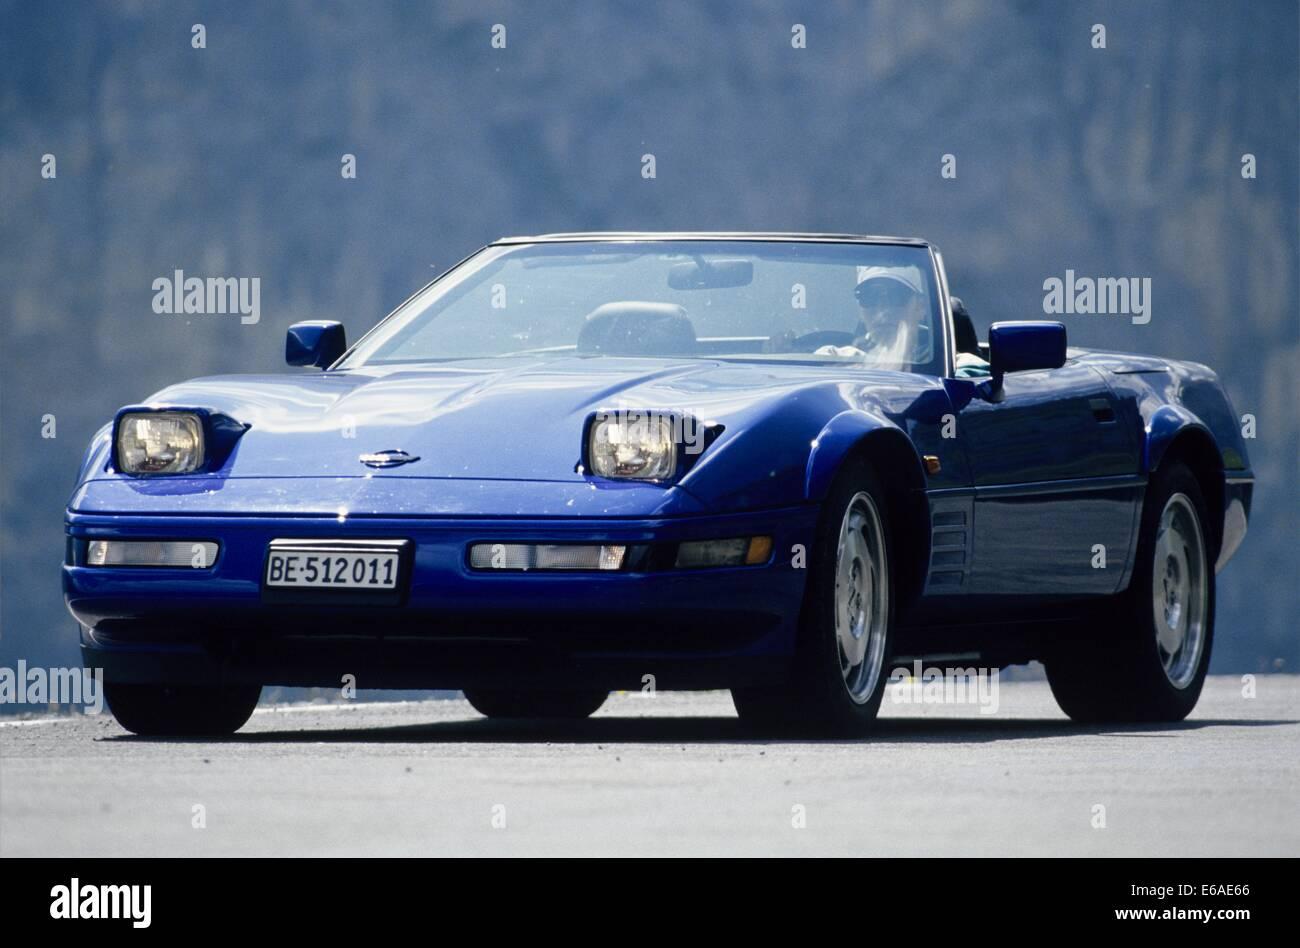 Chevrolet Corvette C4 fourth generation - 1994 Model Year in